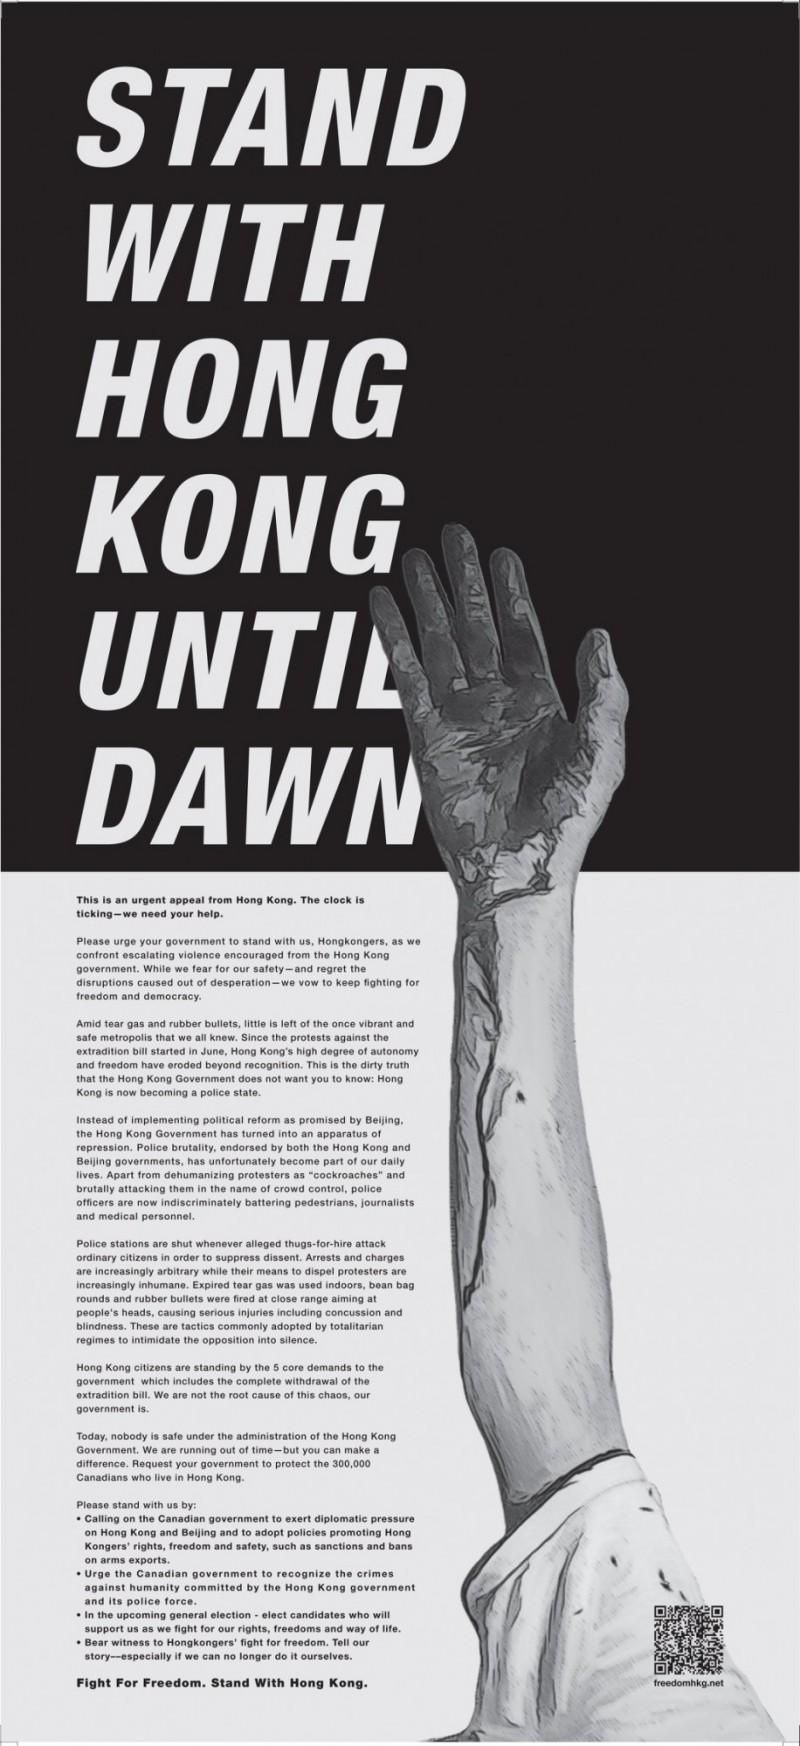 加拿大《環球郵報》。(照片取自Freedom HONG KONG臉書)